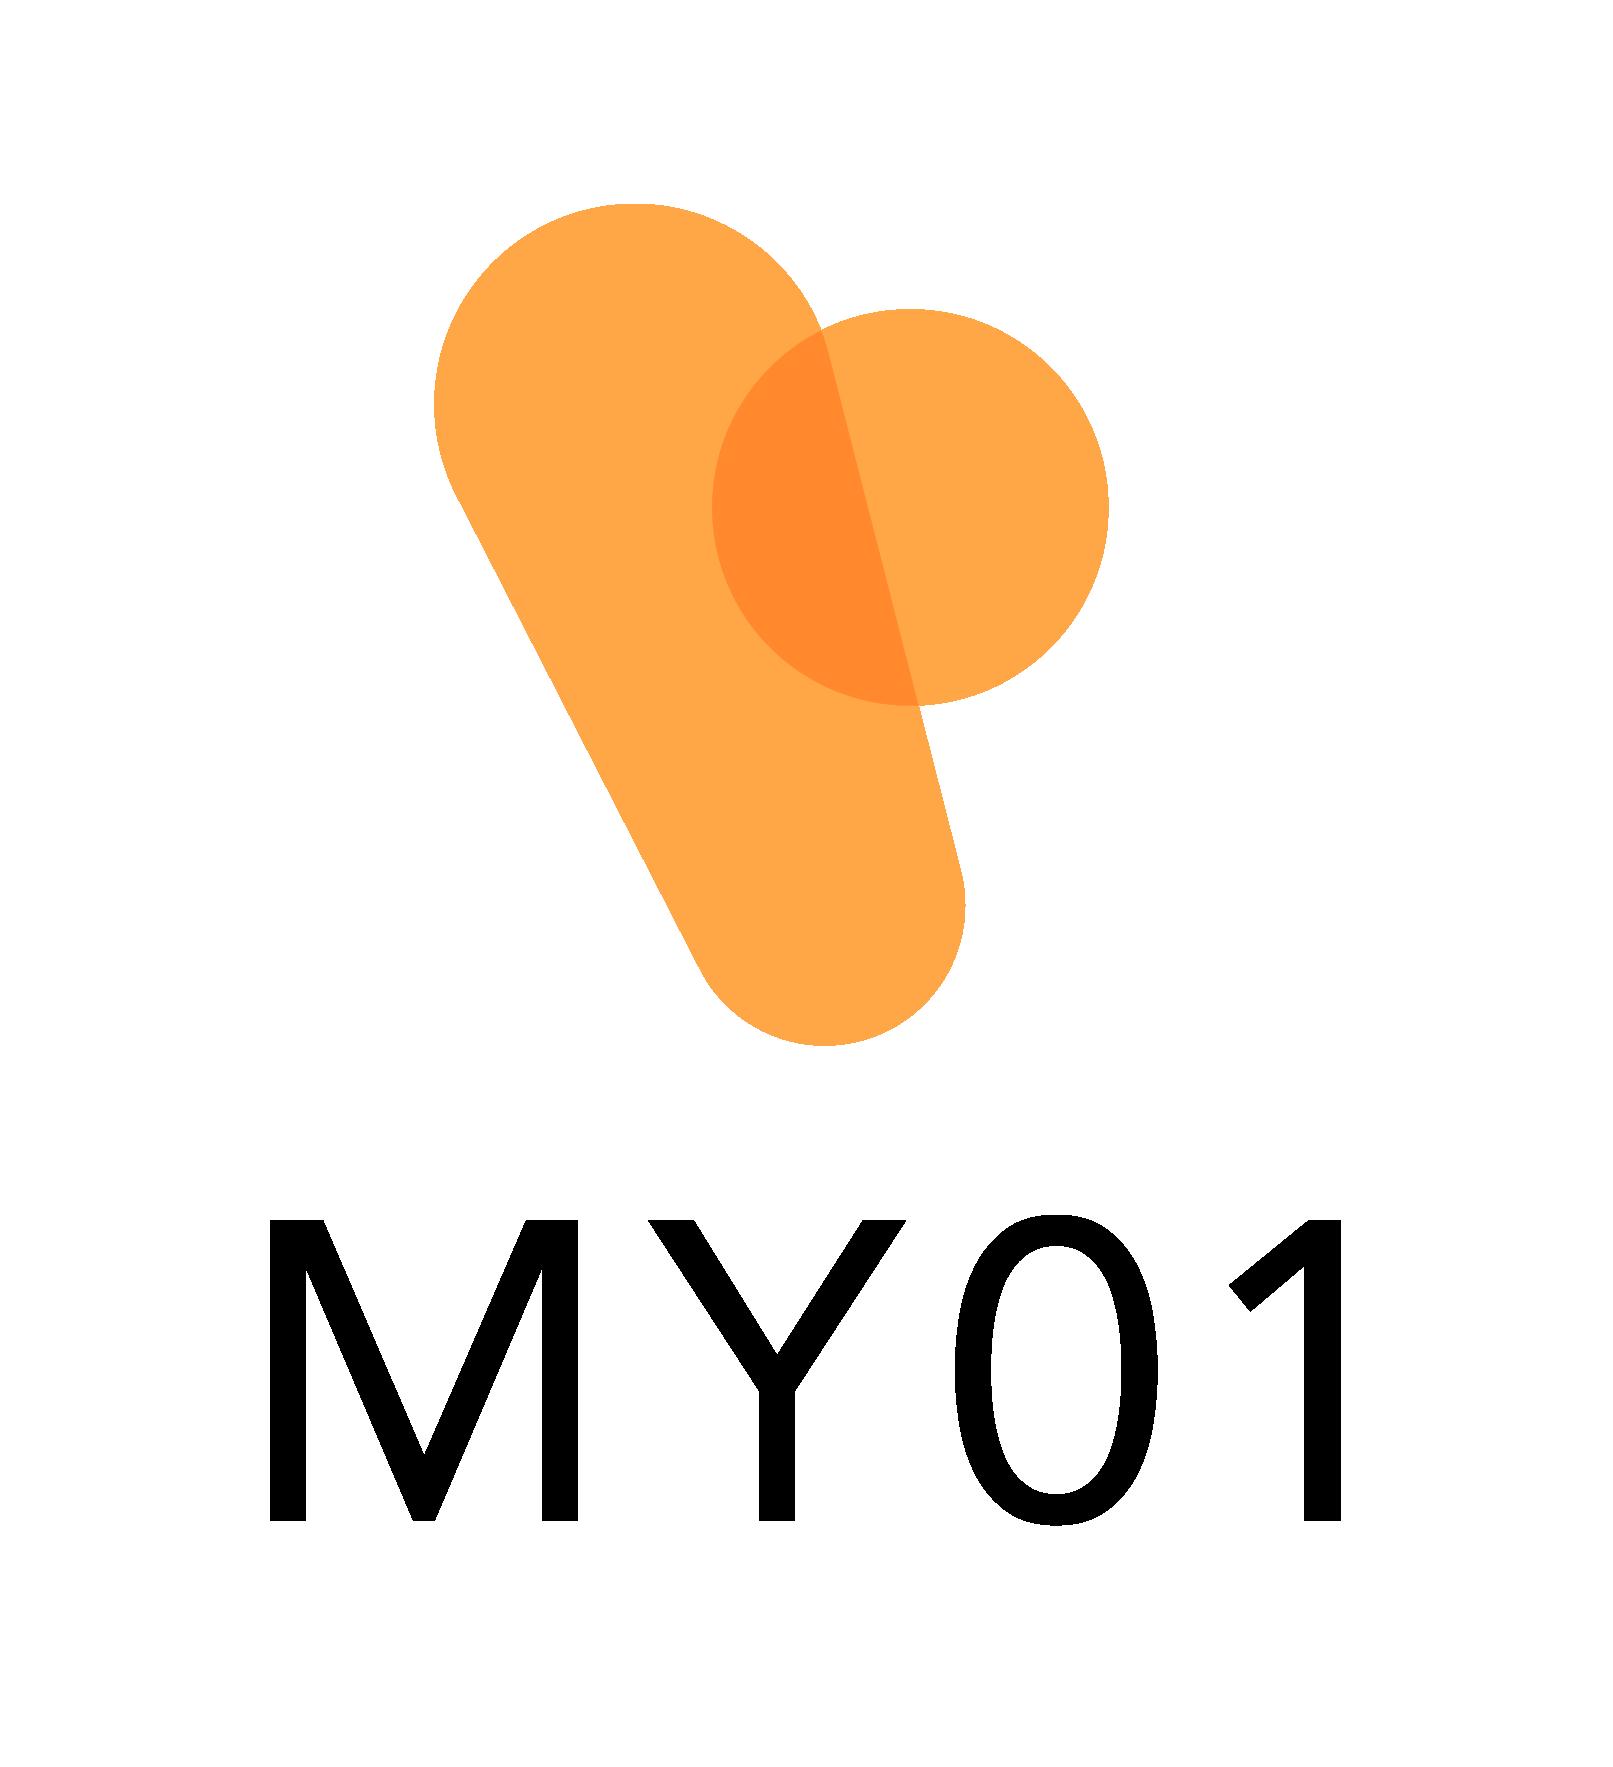 MY01 Logo 3 (1) - Abdelkrim Temzi.png